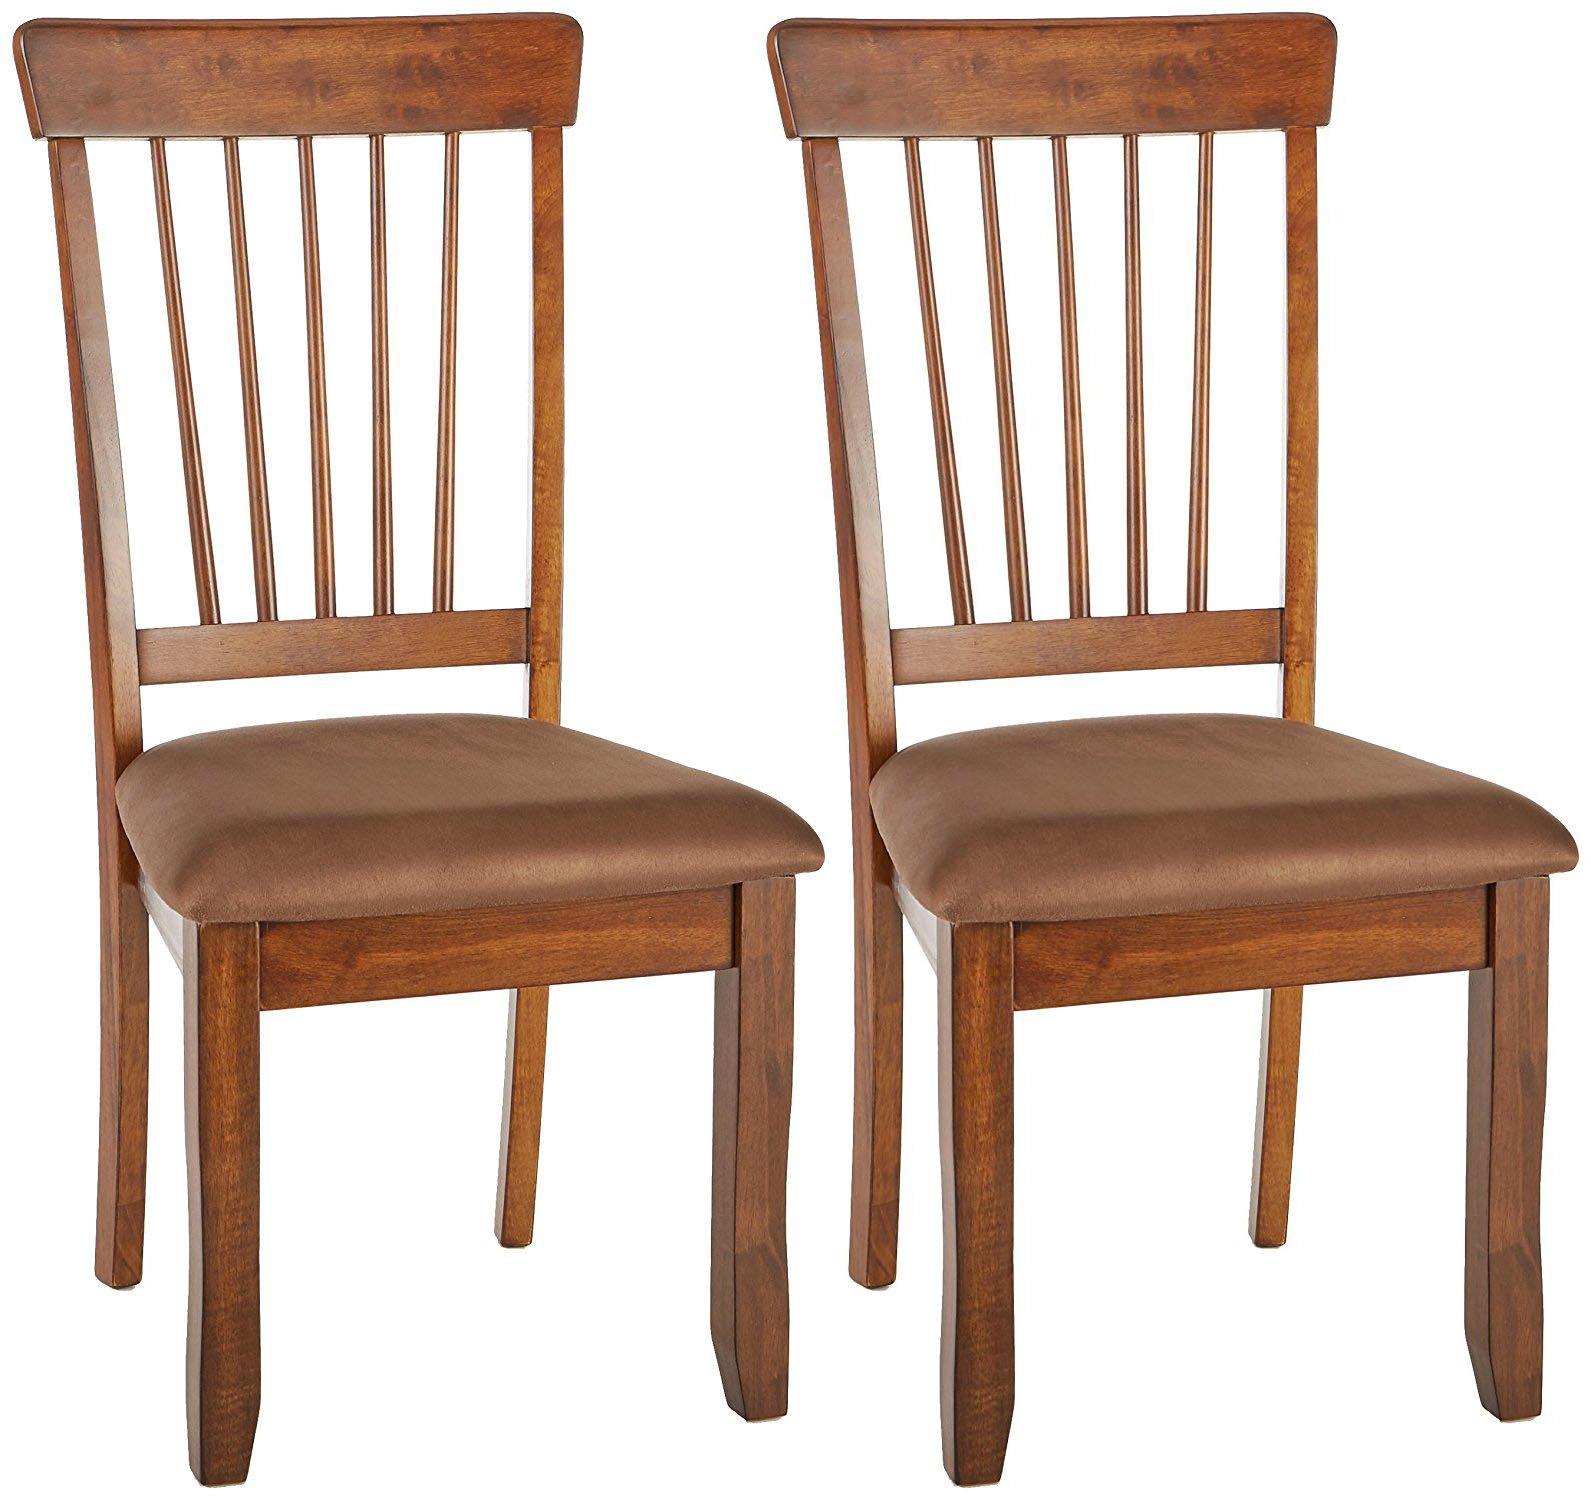 Ashley Furniture Signature Design - Berringer Dining Side Chair - Spindle Back - Set of 2 - Hickory Stain Finish by Signature Design by Ashley